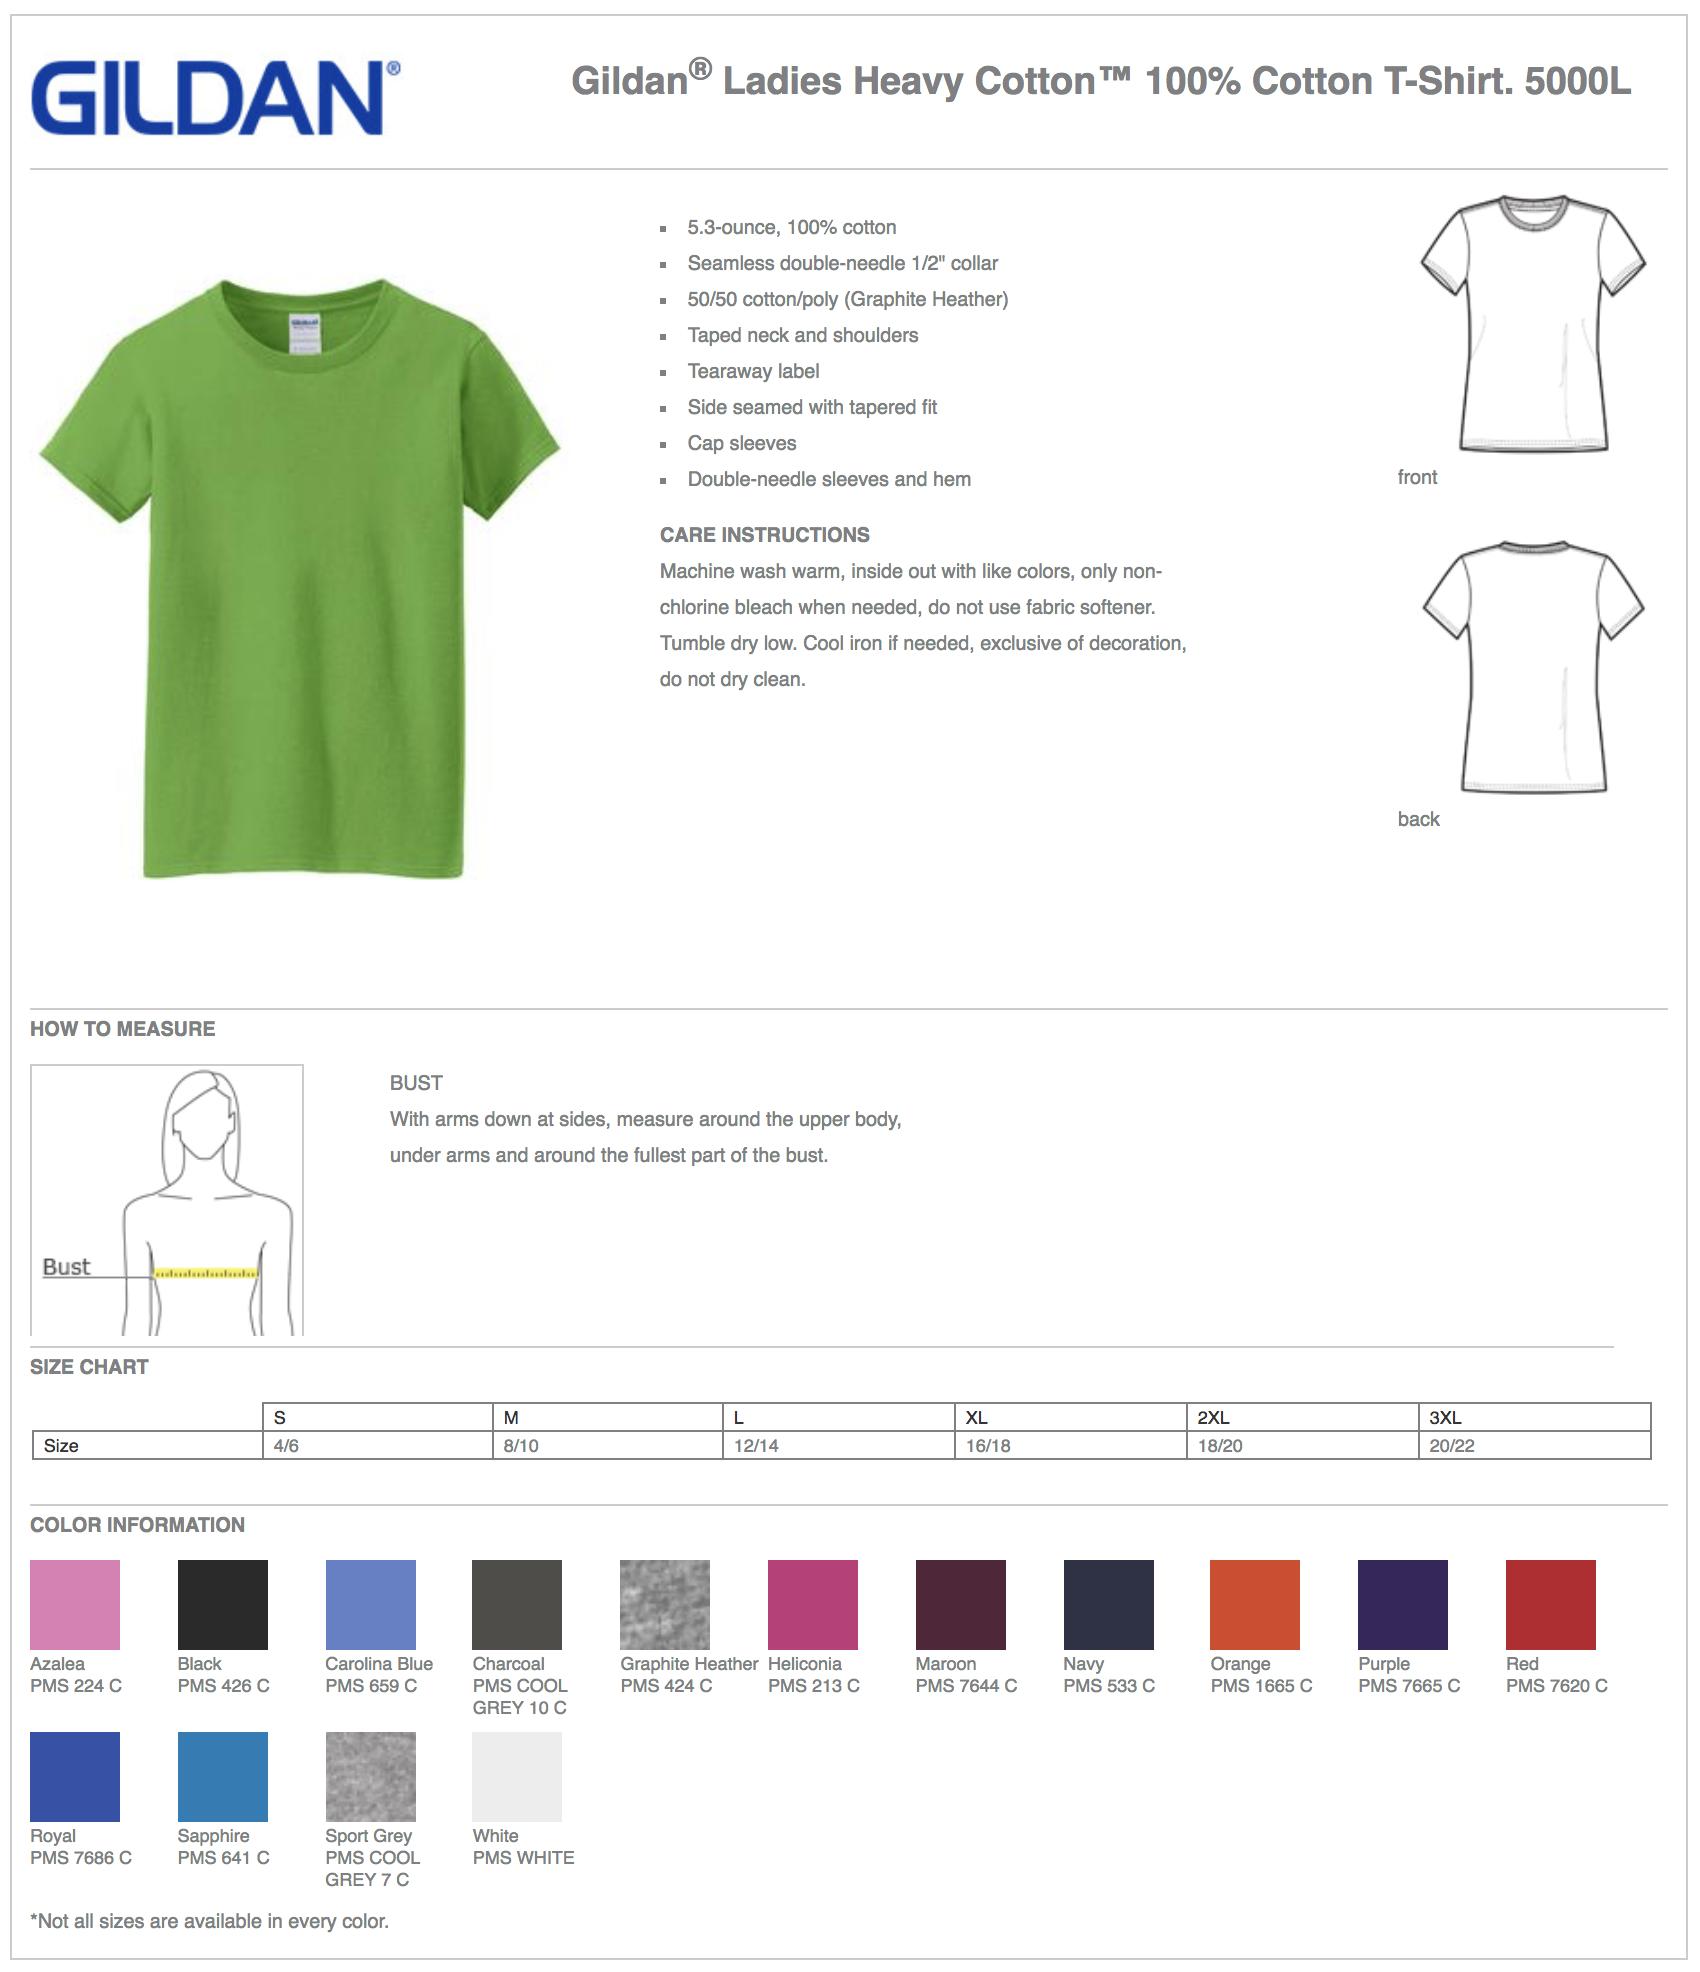 Gildan 5400L Women's Long Sleeve Custom T-Shirts